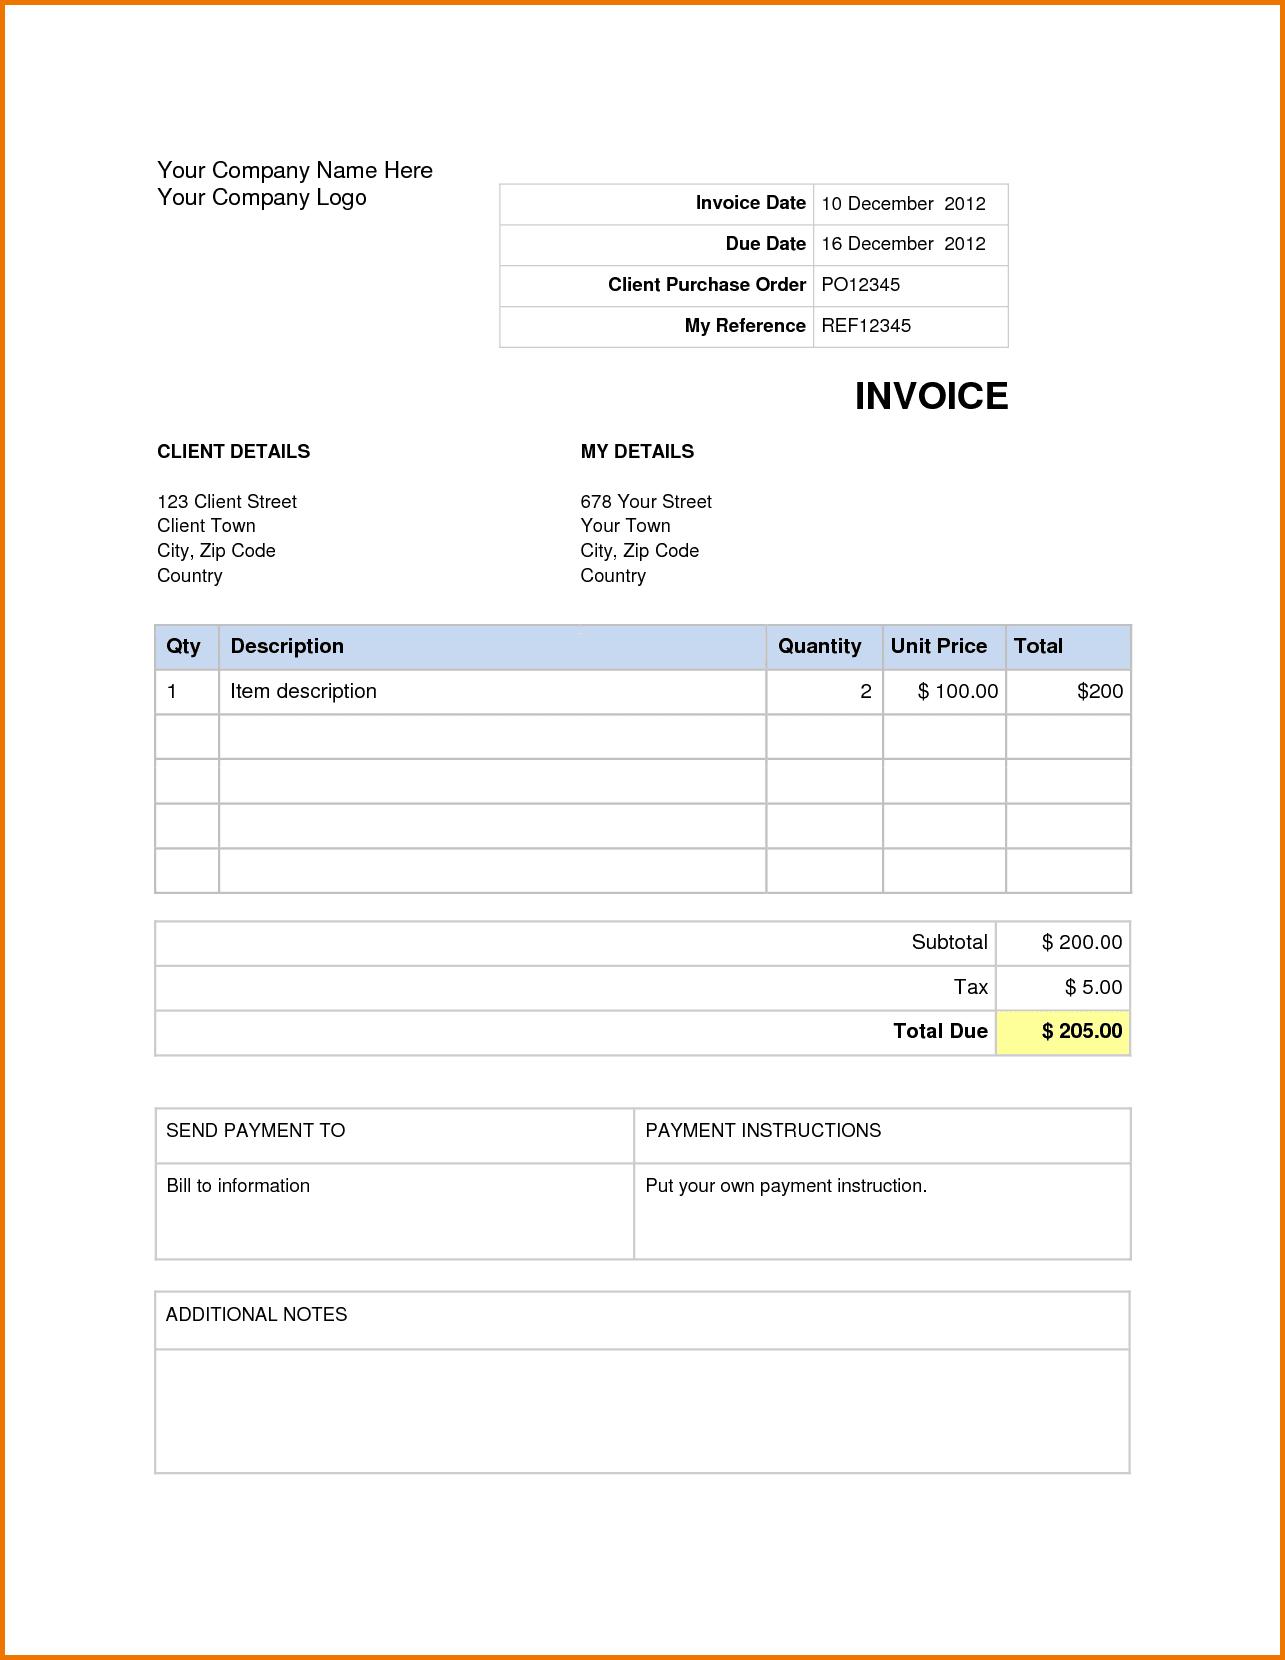 Invoice Template Microsoft Word 2007 Invoice Template Microsoft Word Spreadsheet Templates for Busines Spreadsheet Templates for Busines Ms Word 2013 Invoice Template